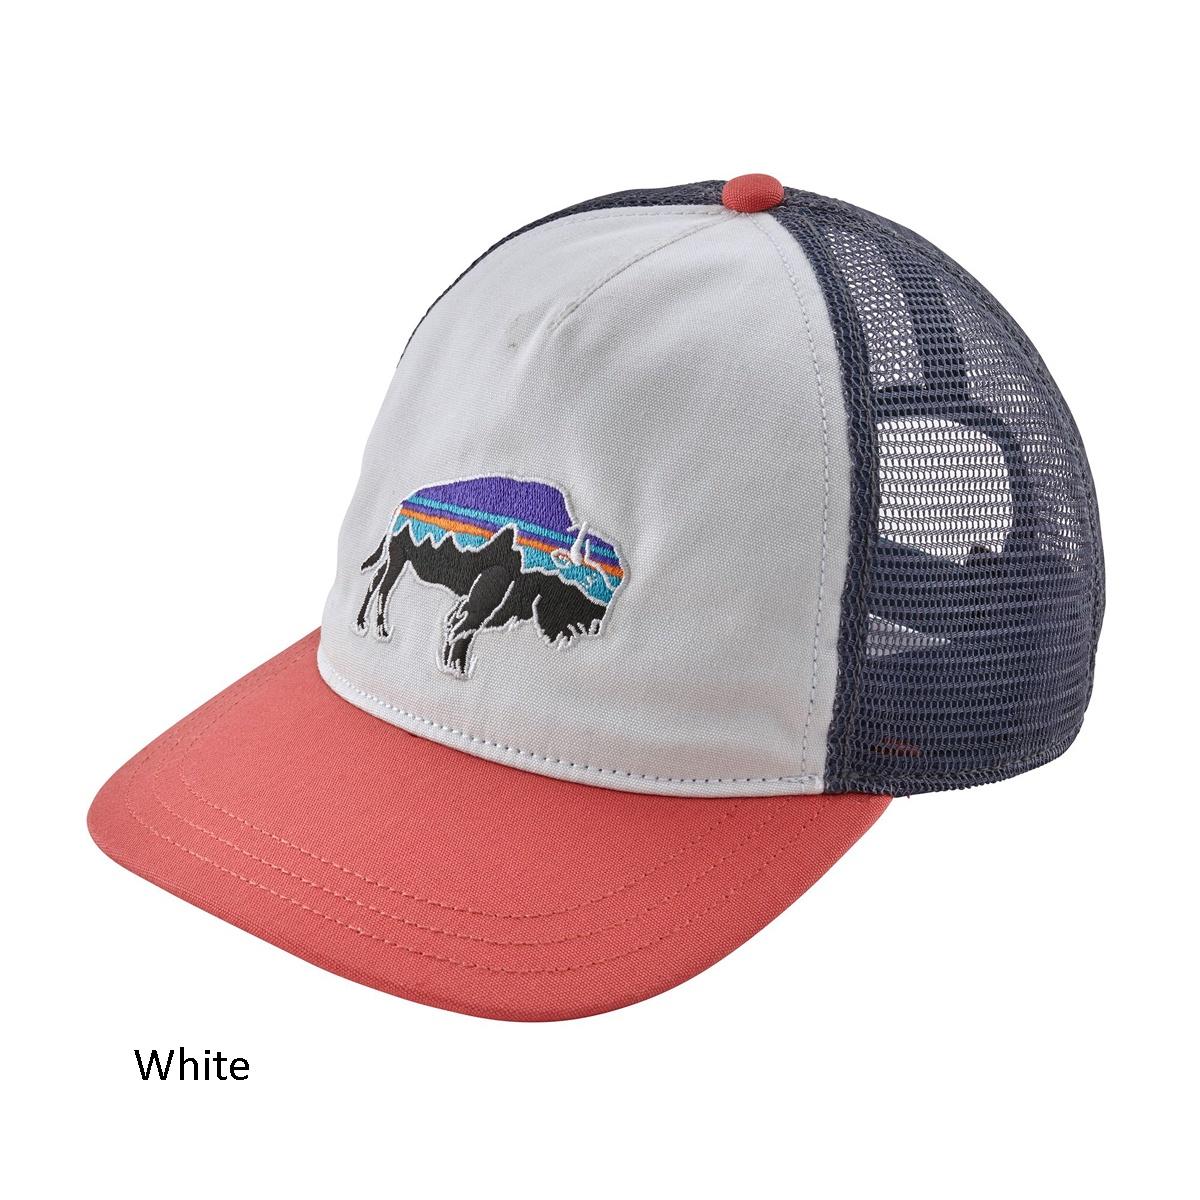 3816730c5e5 Patagonia Women s Fitz Roy Bison Layback Trucker Hat